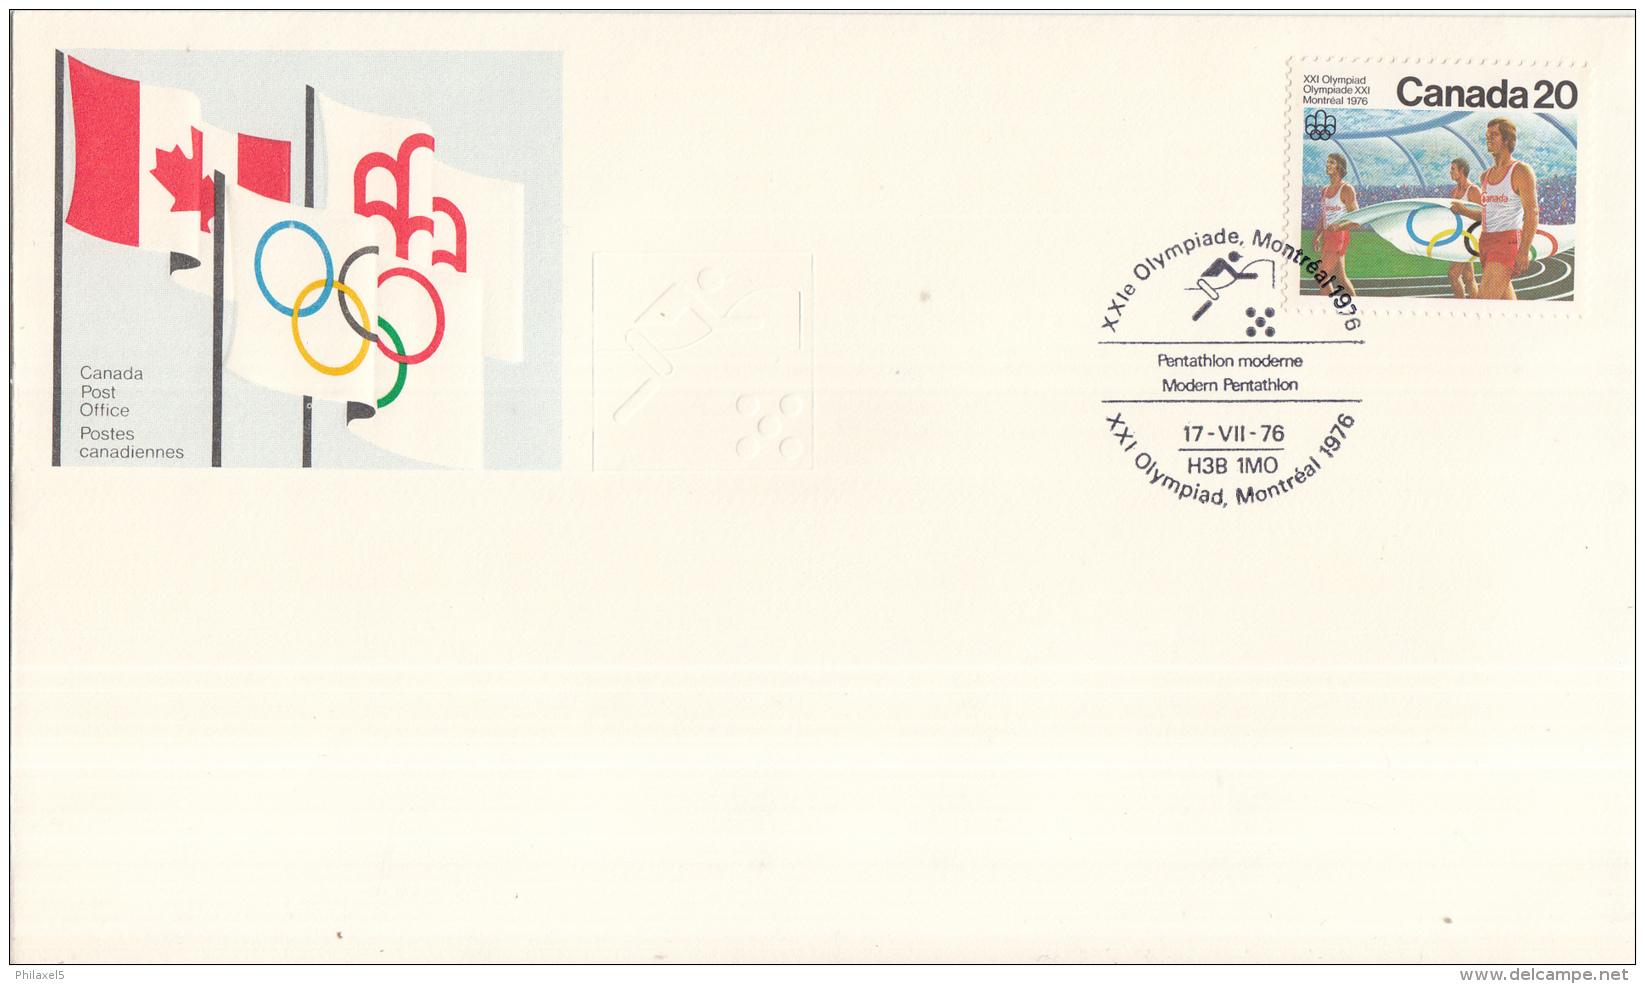 Canada - XXIe Olympiade. Montreal 1976 - 17 Juli 1976 - Pentathlon Moderne/Modern Pentathlon/Moderne Vijfkamp - M 631 - Estate 1976: Montreal